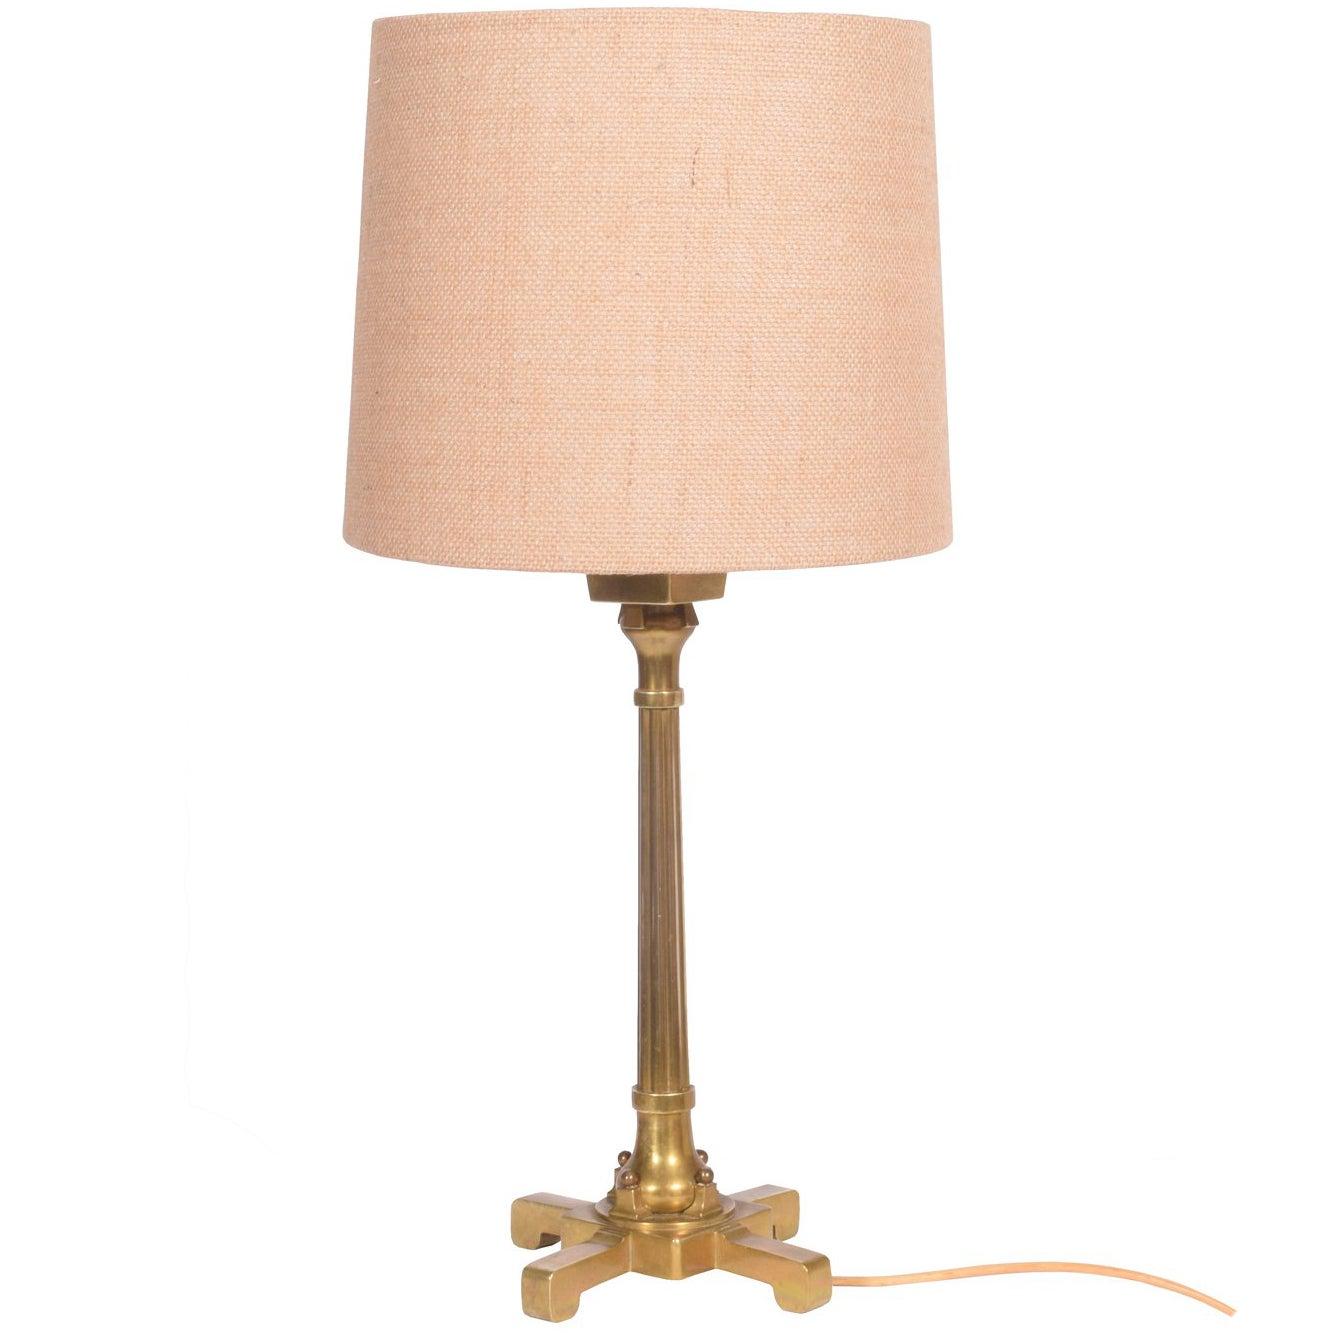 Thorvald Bindesbøll Arts & Craft Brass Table Lamp